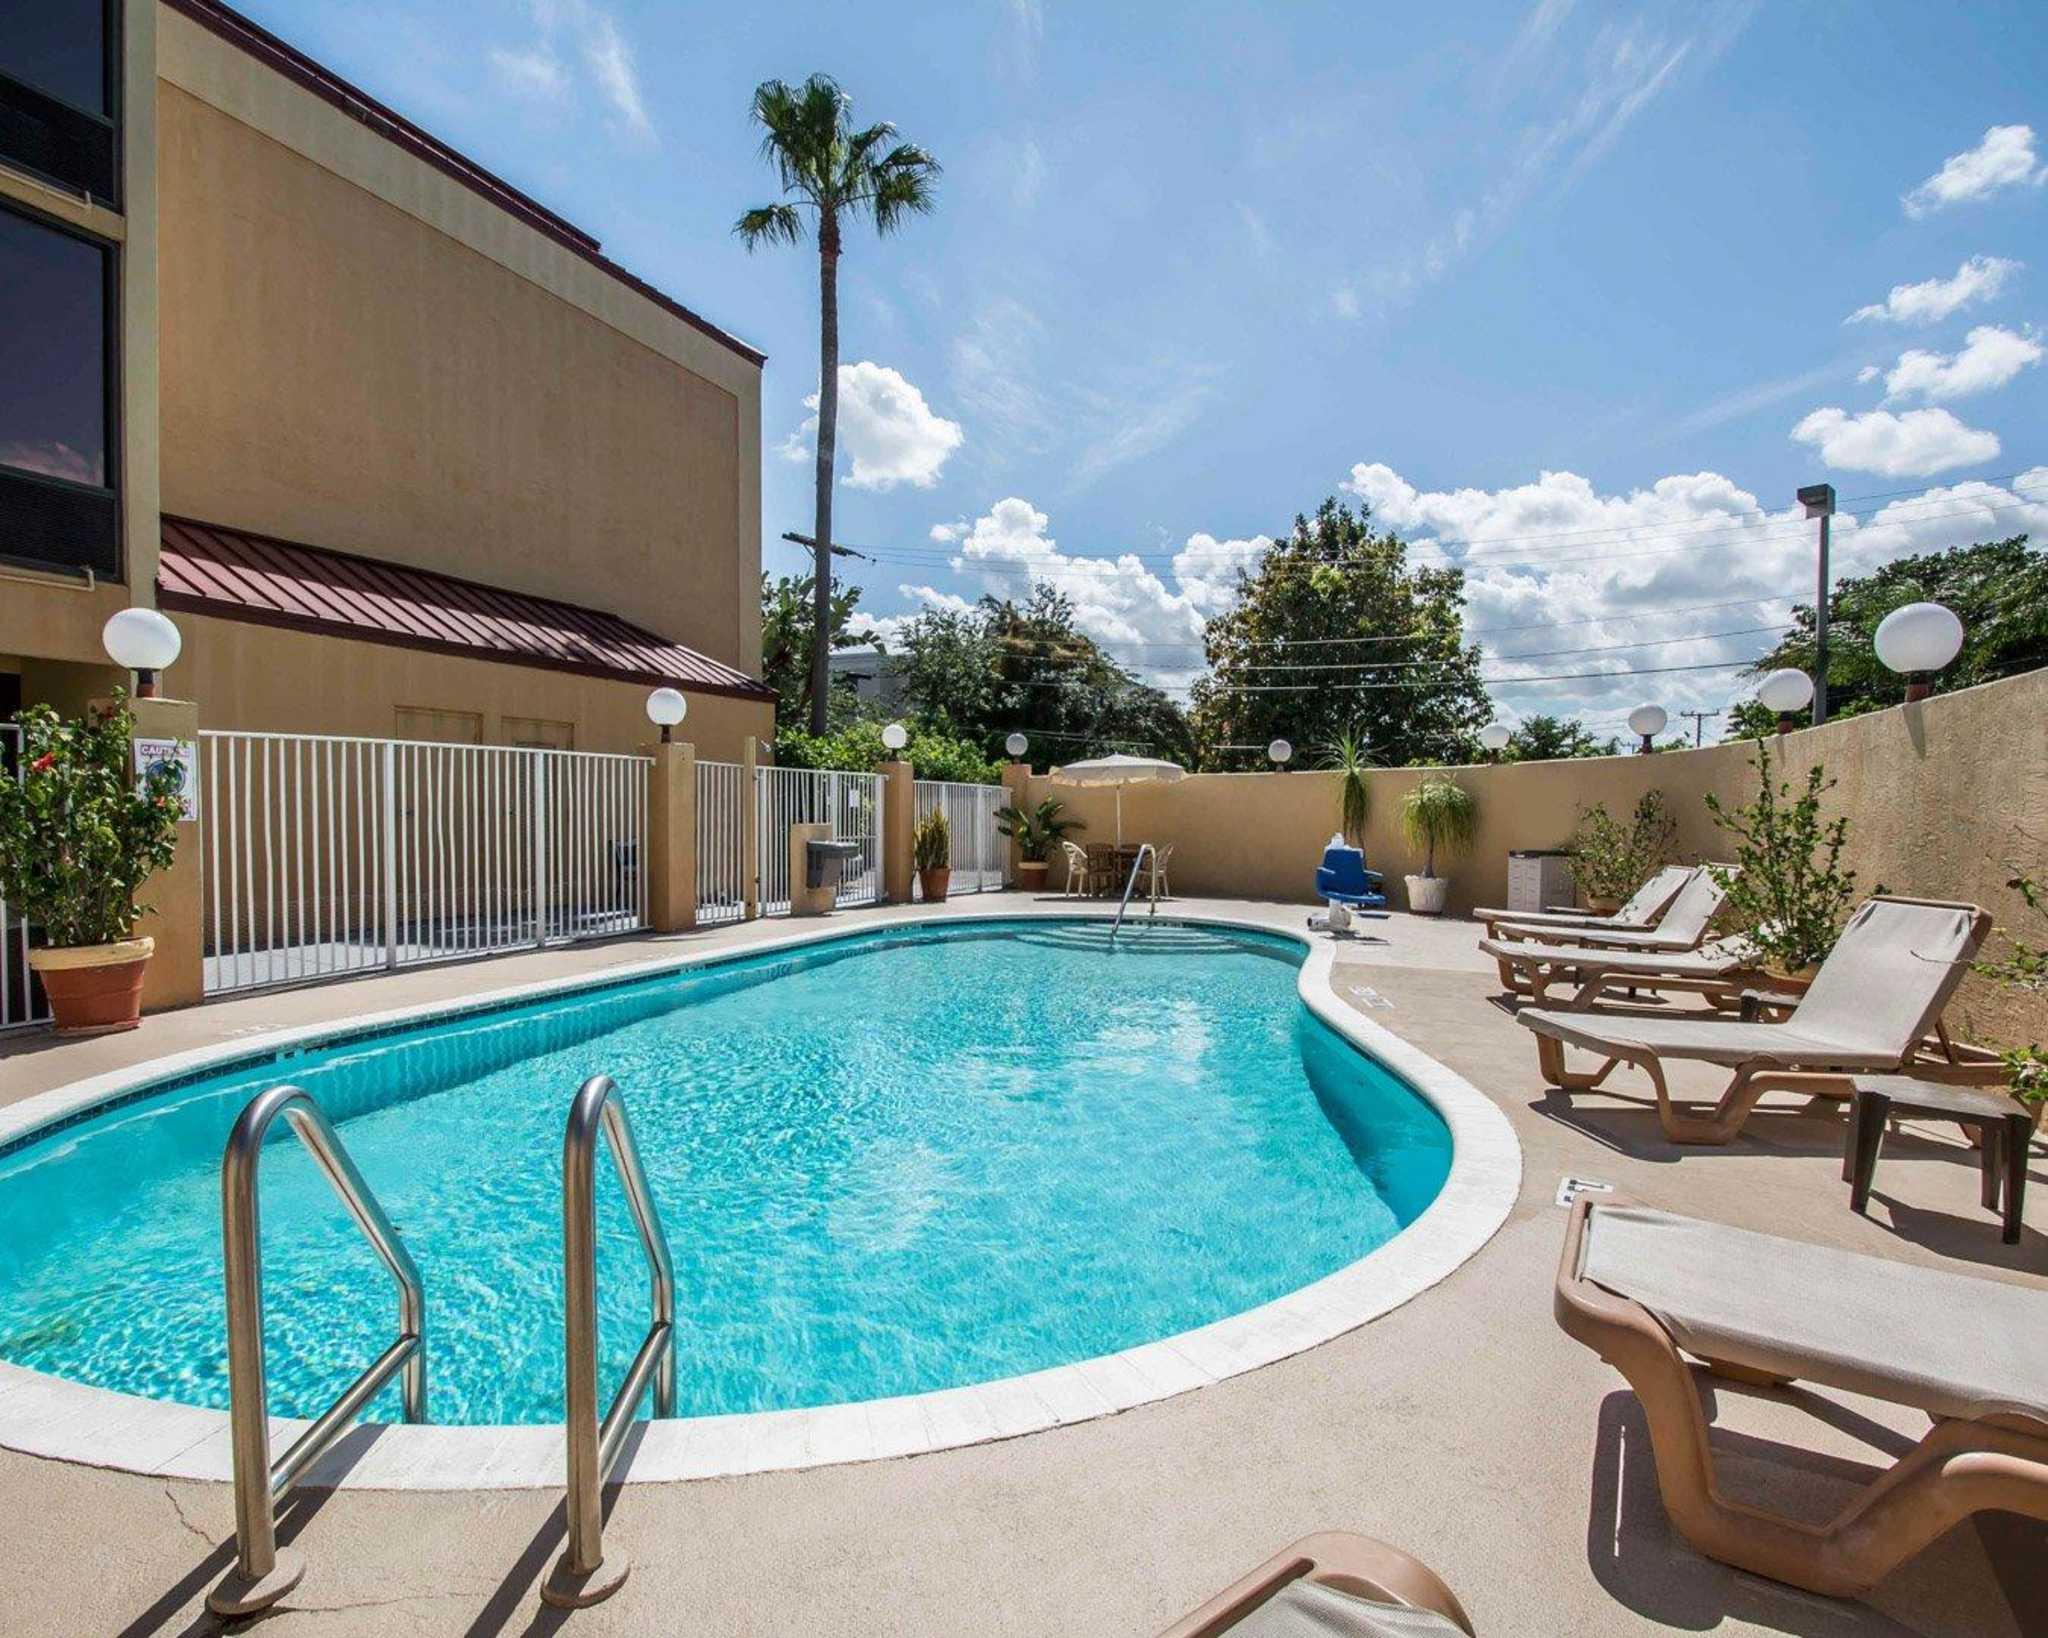 Comfort Inn & Suites Lantana - West Palm Beach South image 0